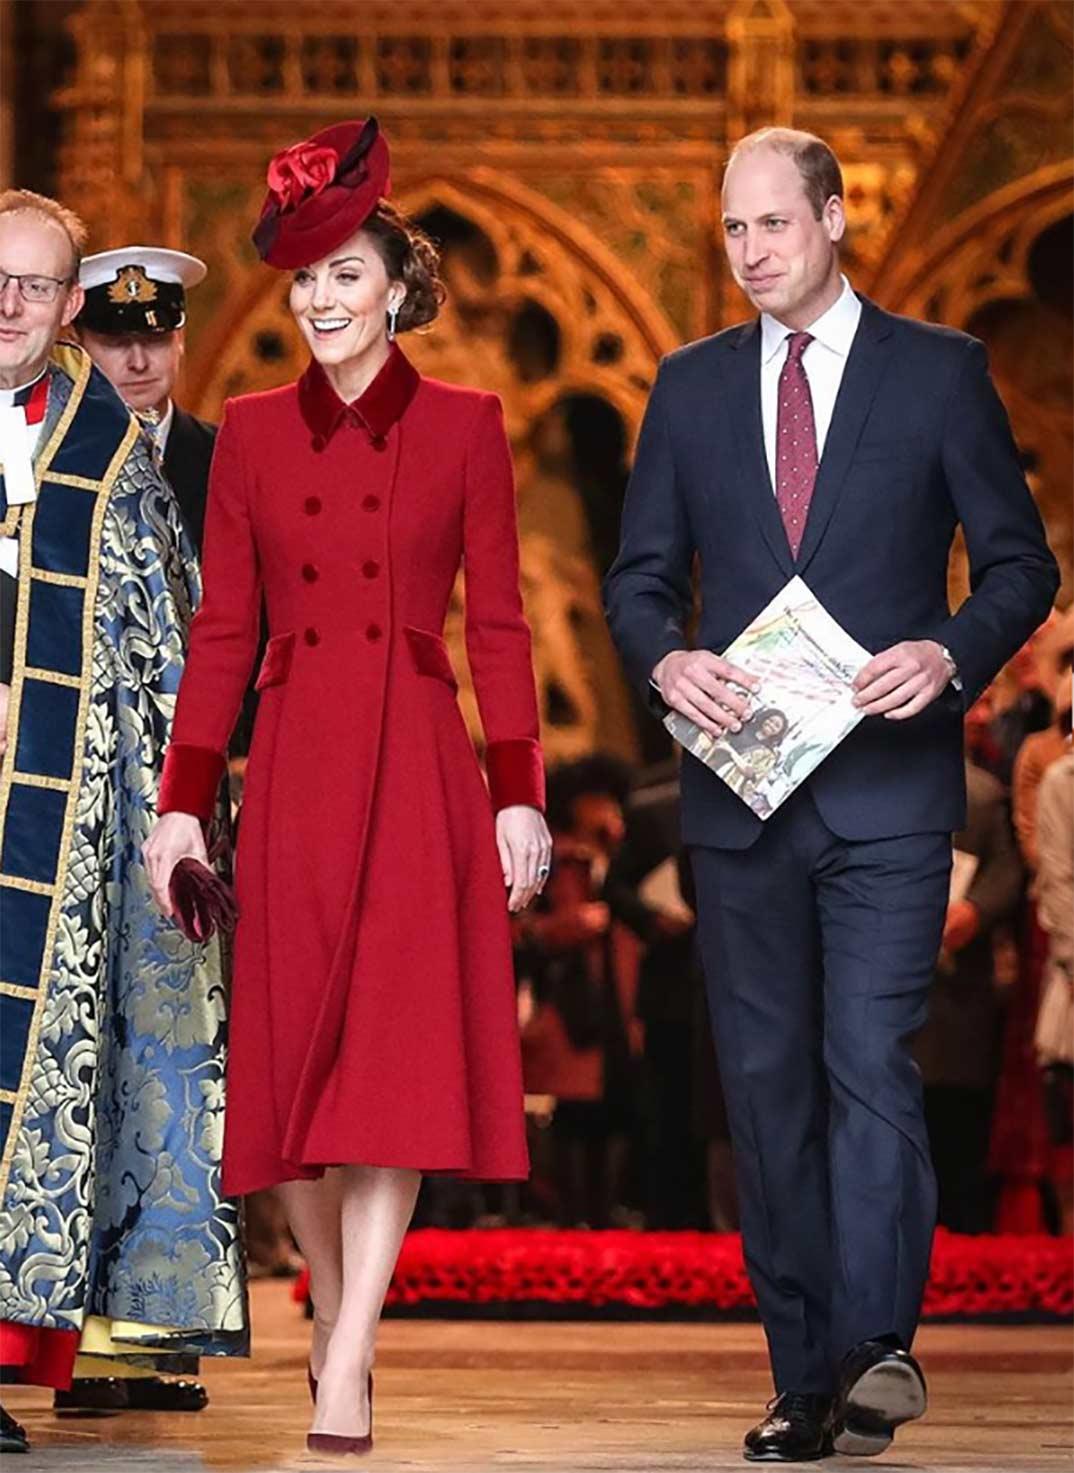 Duques de Cambridge © royalfamily/Instagram